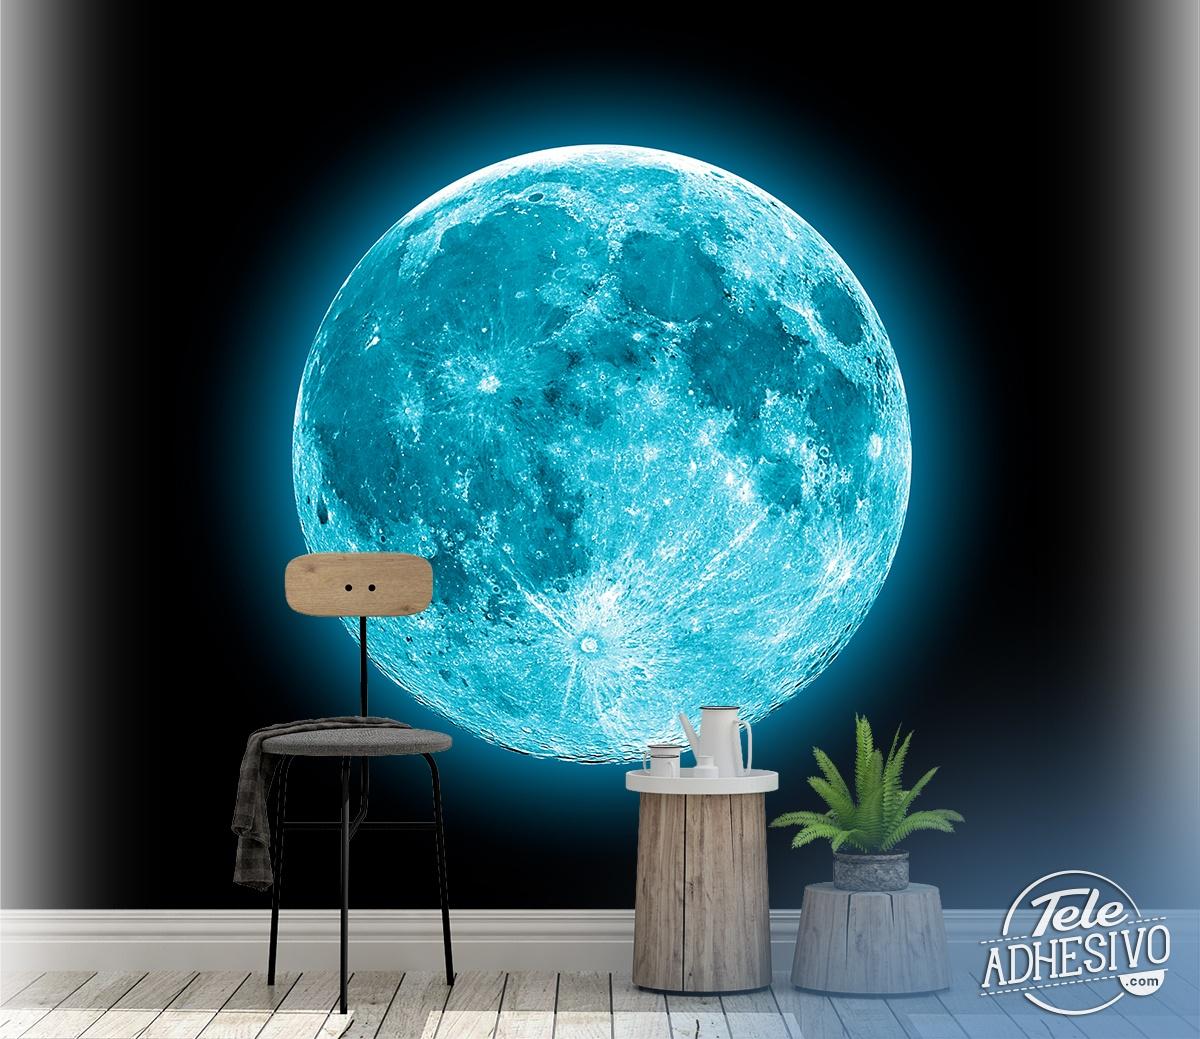 Wall Mural Blue Moon Muraldecal Com